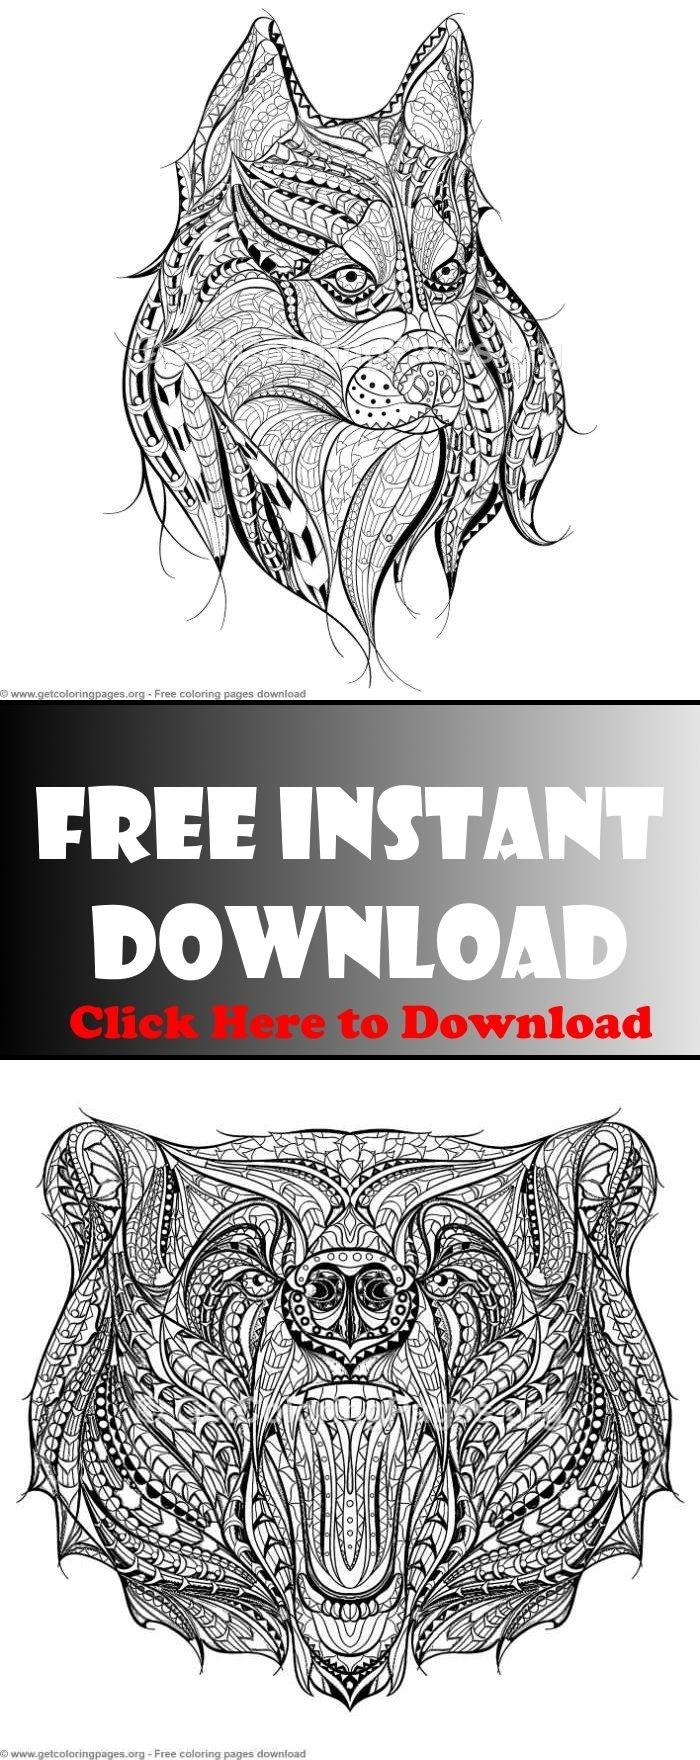 Zentangle Patterns Animals,zentangle Animals Easy,zentangle Patterns - Free Printable Zentangle Templates